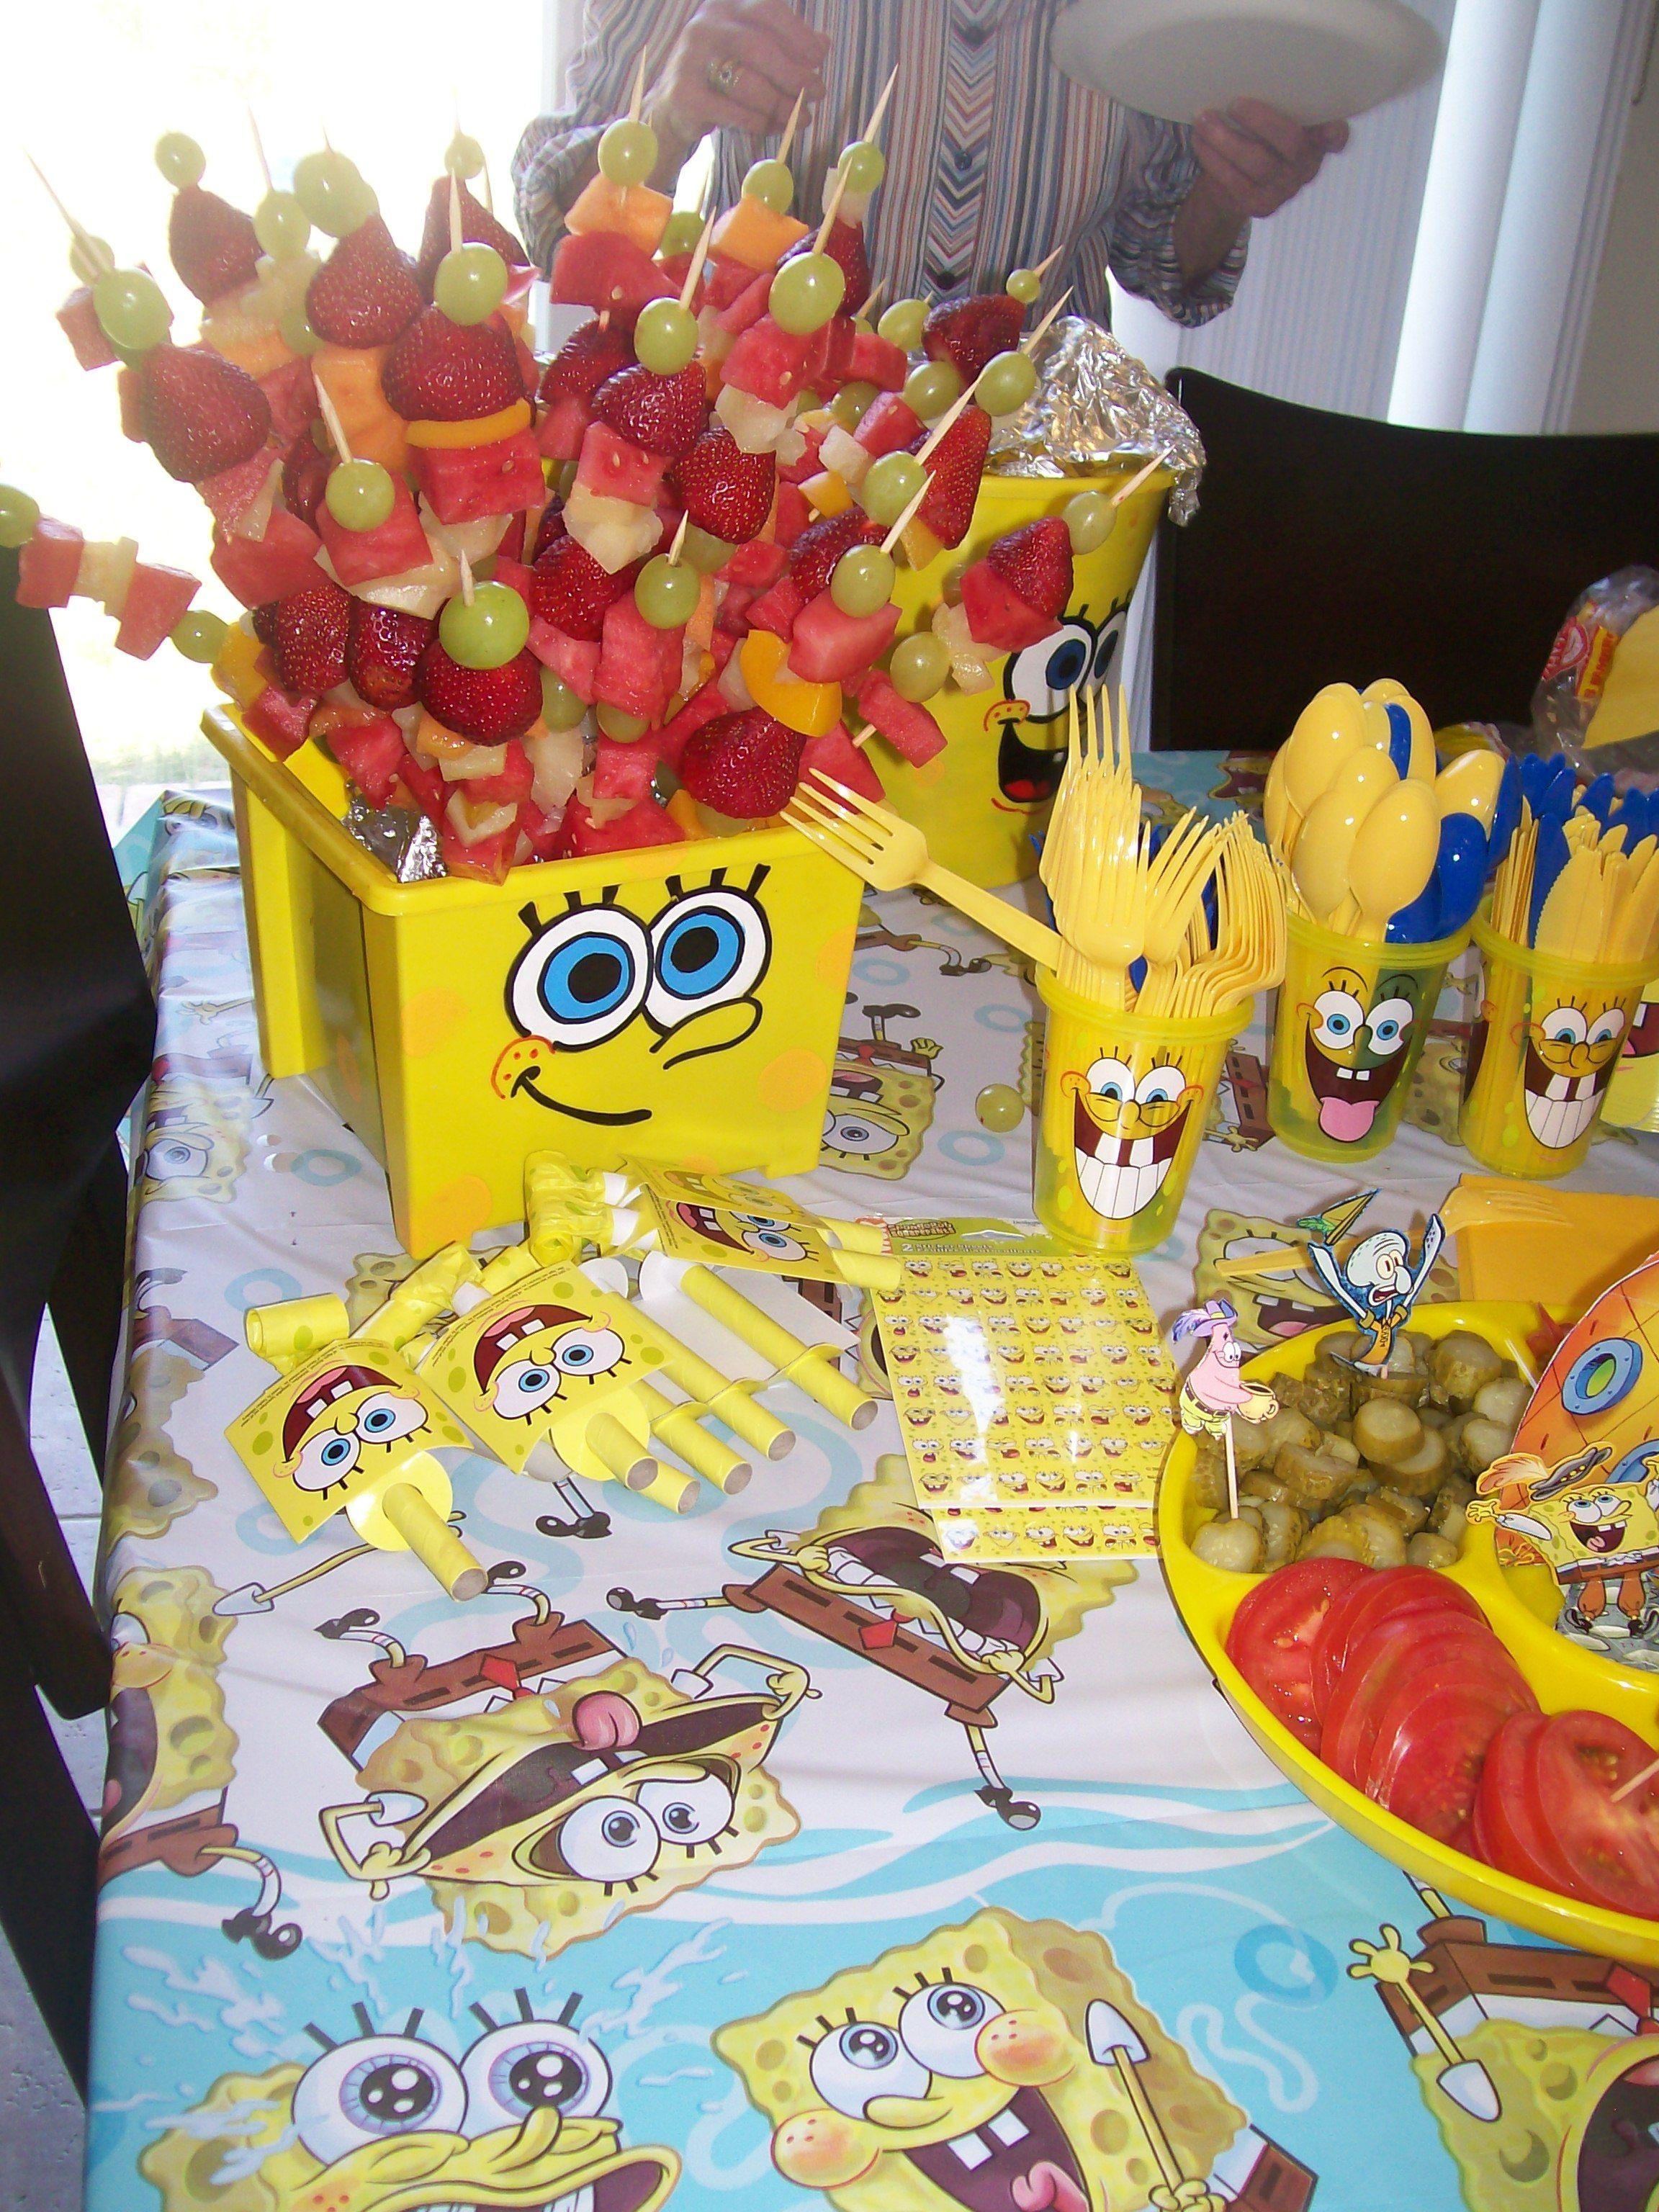 Spongebob Bedroom Decorations Cheap Spongebob Party Idea I Made This From A Cardboard Box